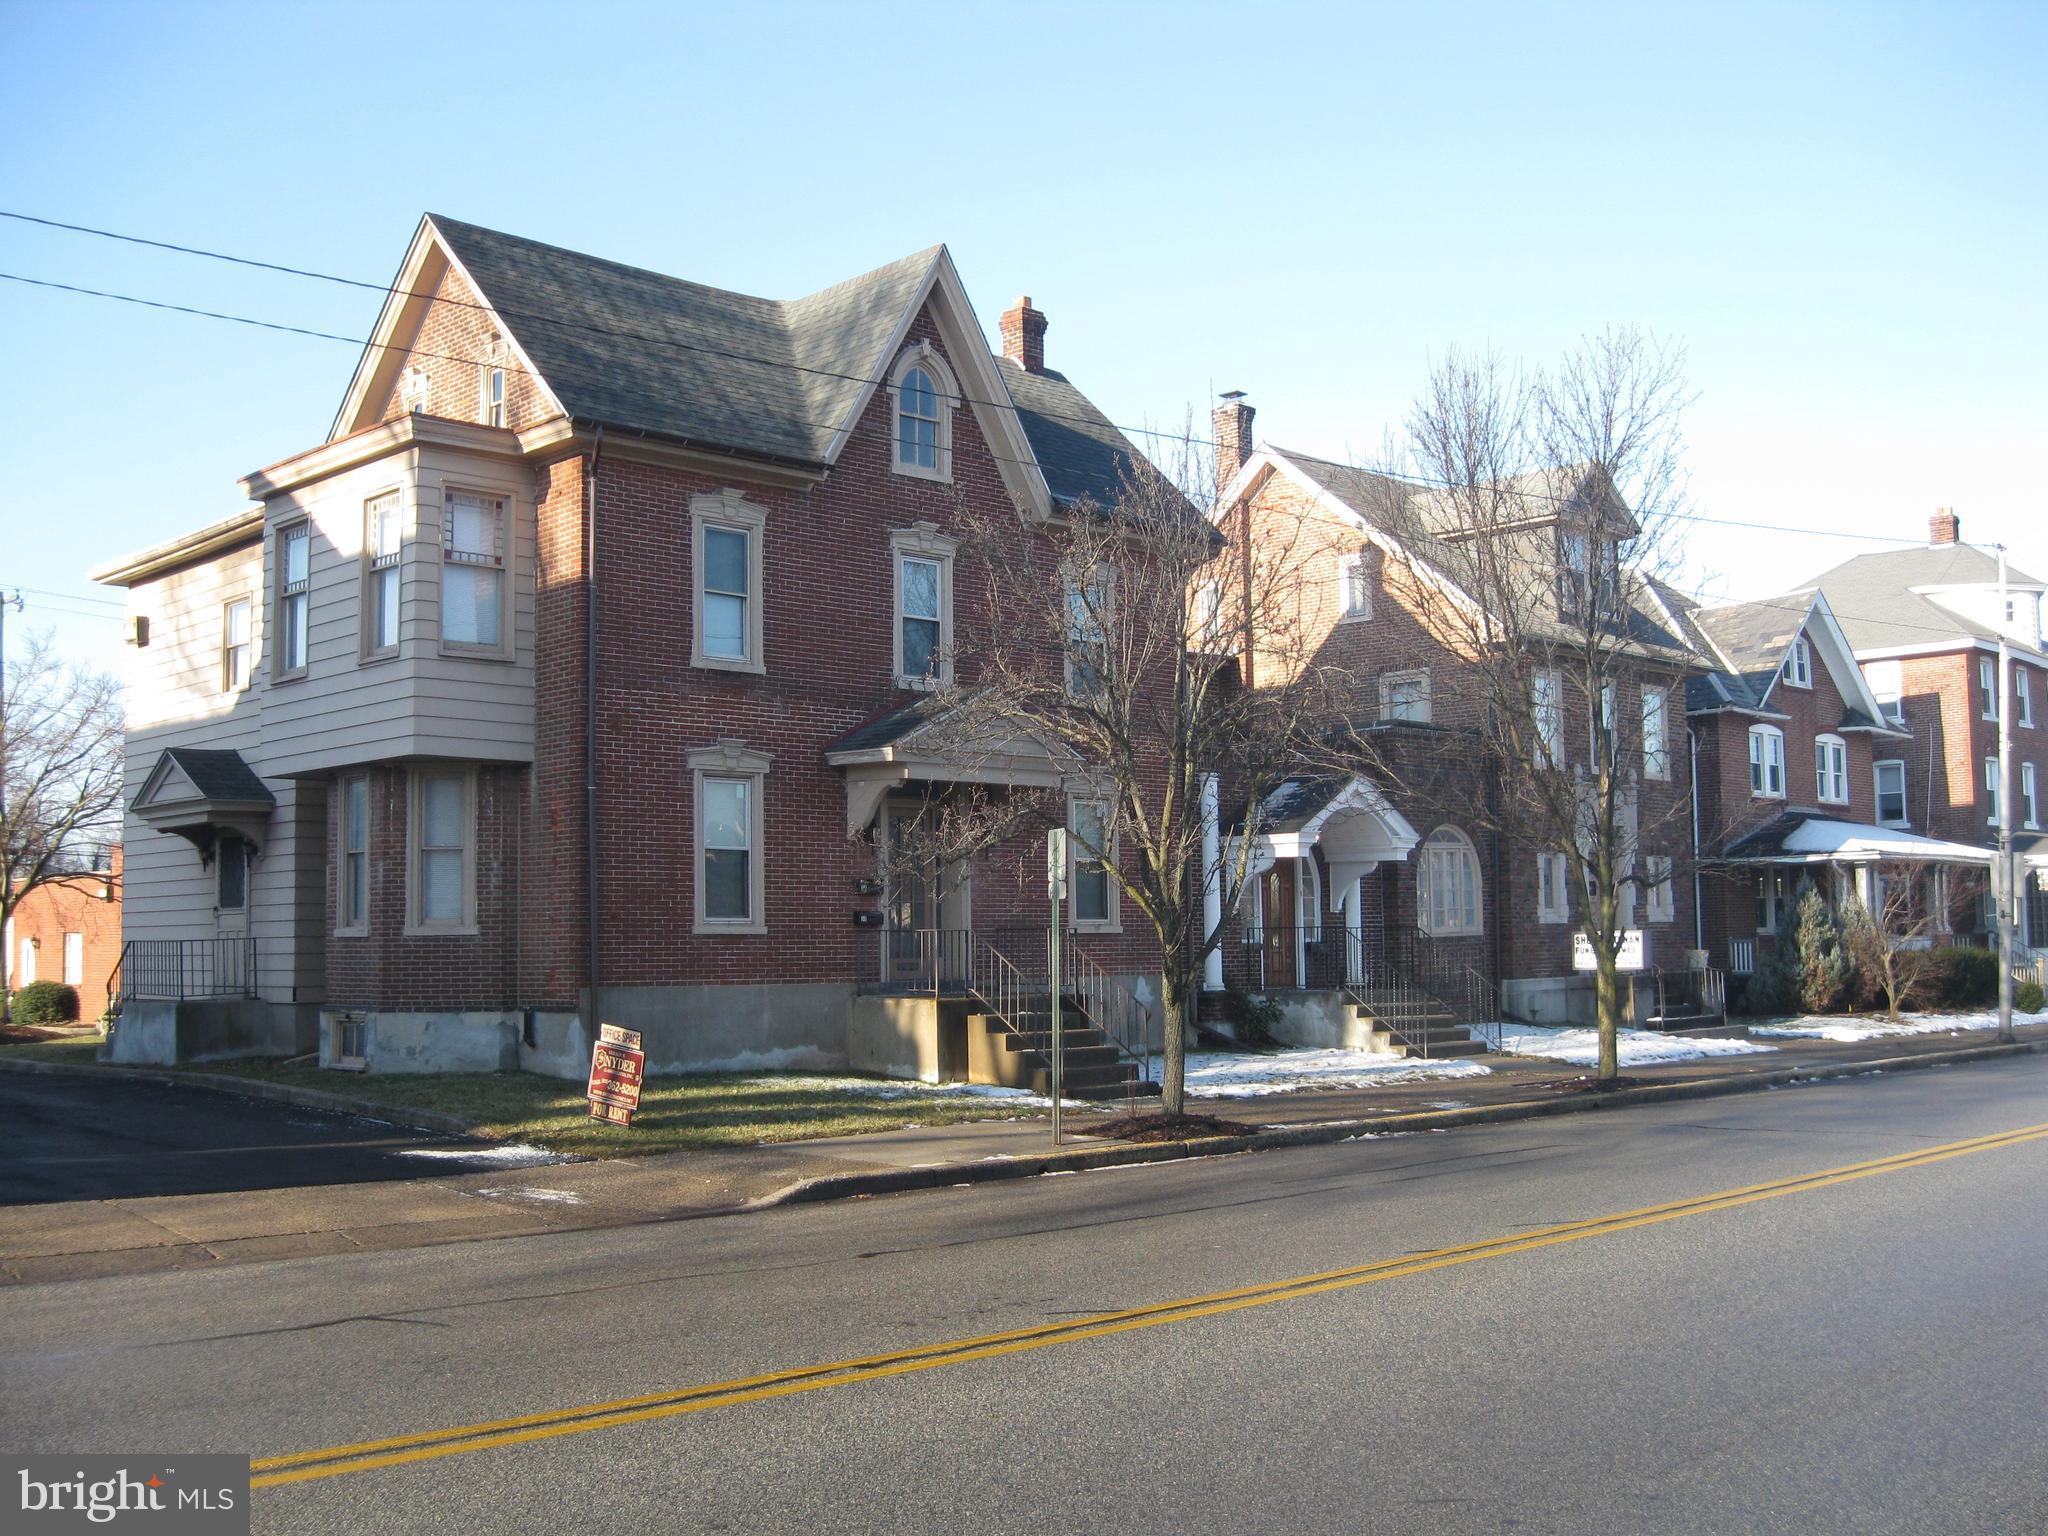 24 E MAIN STREET, LANSDALE, PA 19446